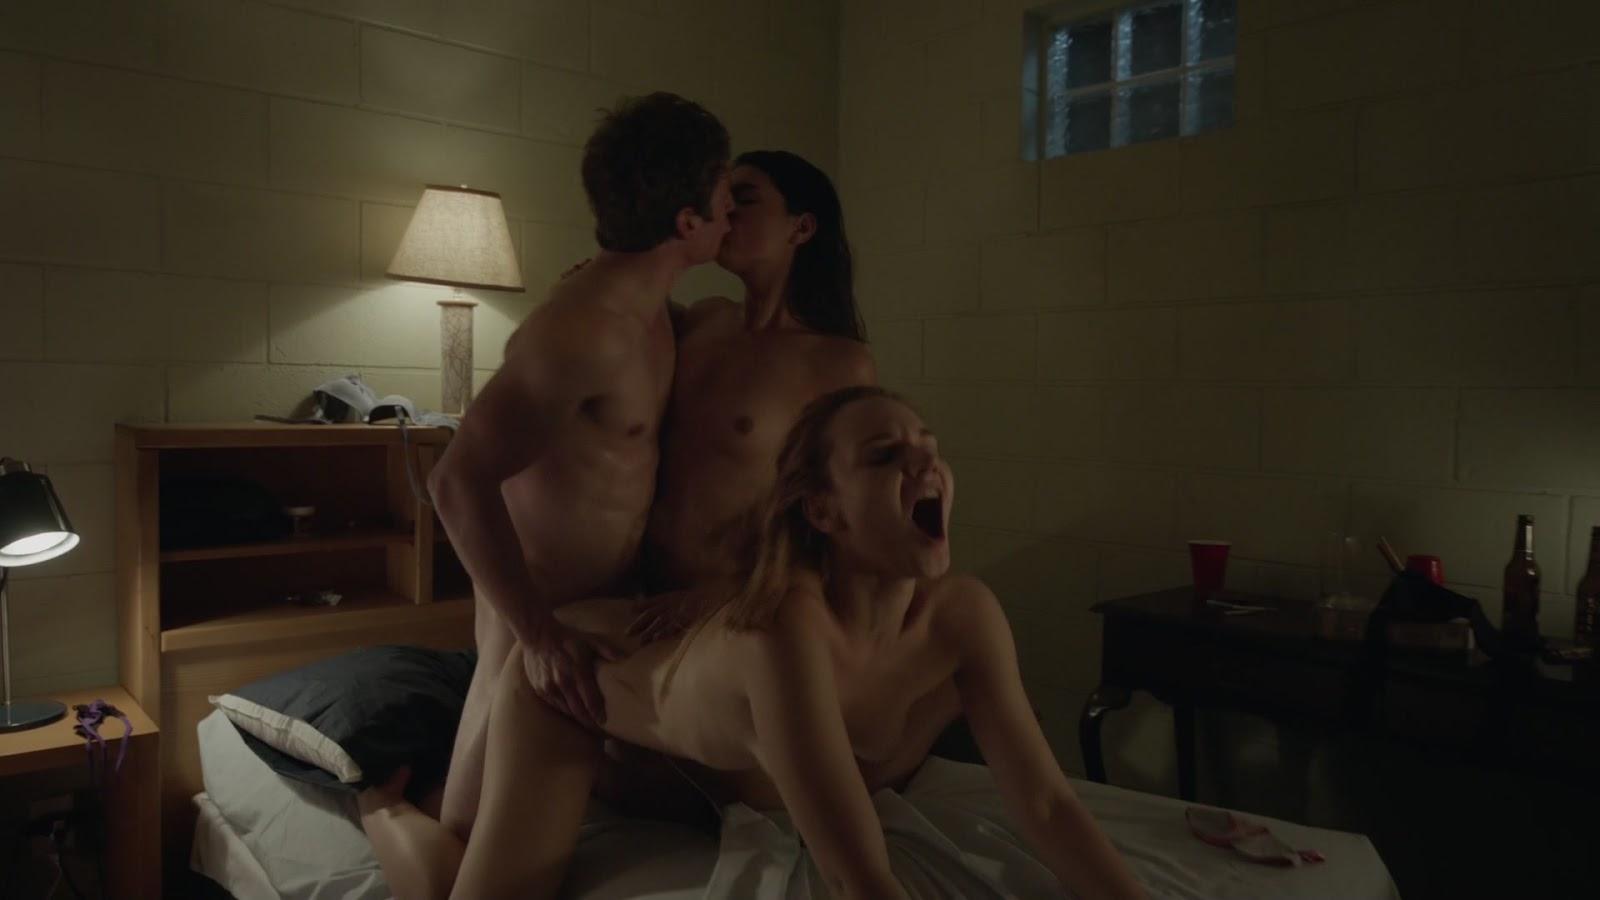 Restituda1S World Of Male Nudity Jeremy Allen White In -2762